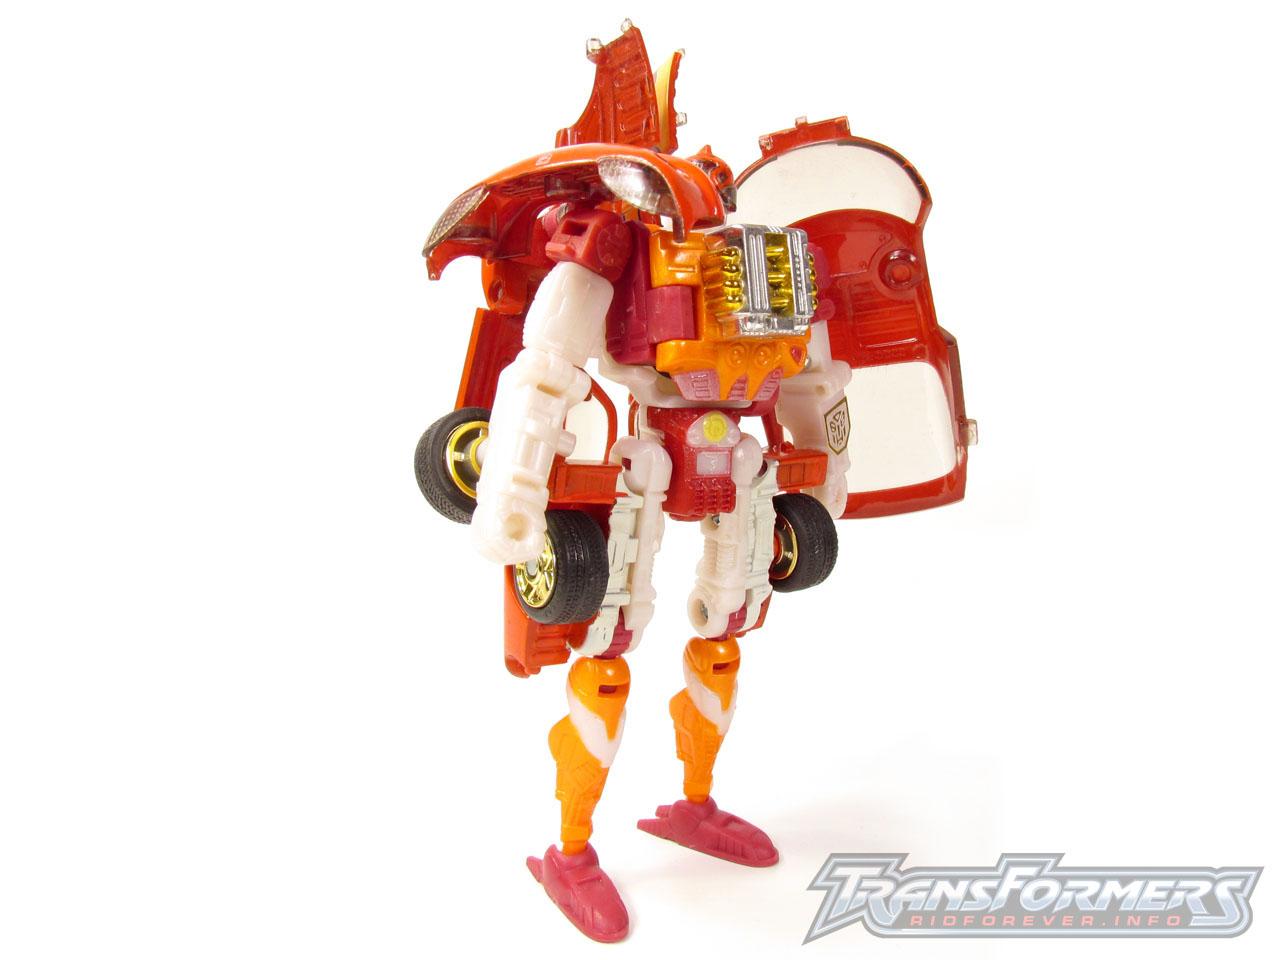 Sideburn Super 006